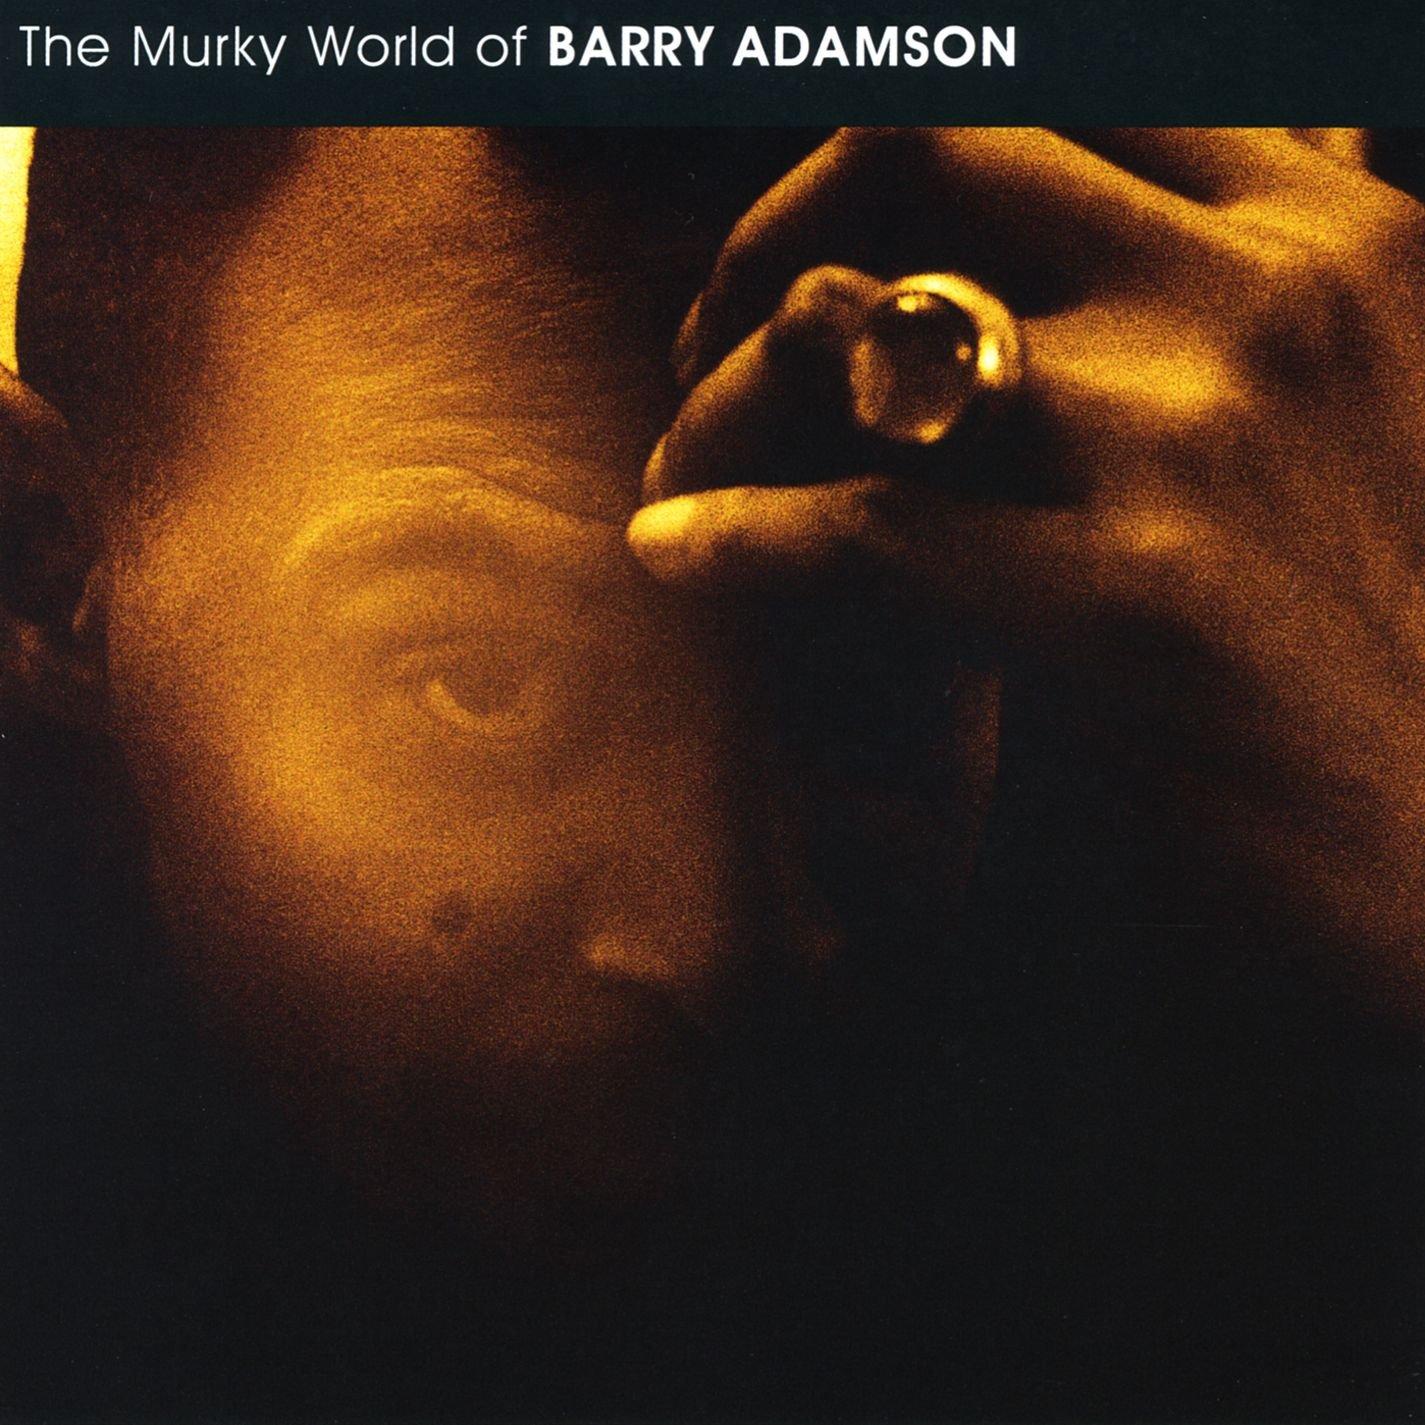 Barry Adamson - The Murky World Of Barry Adamson (1999) [FLAC] Download